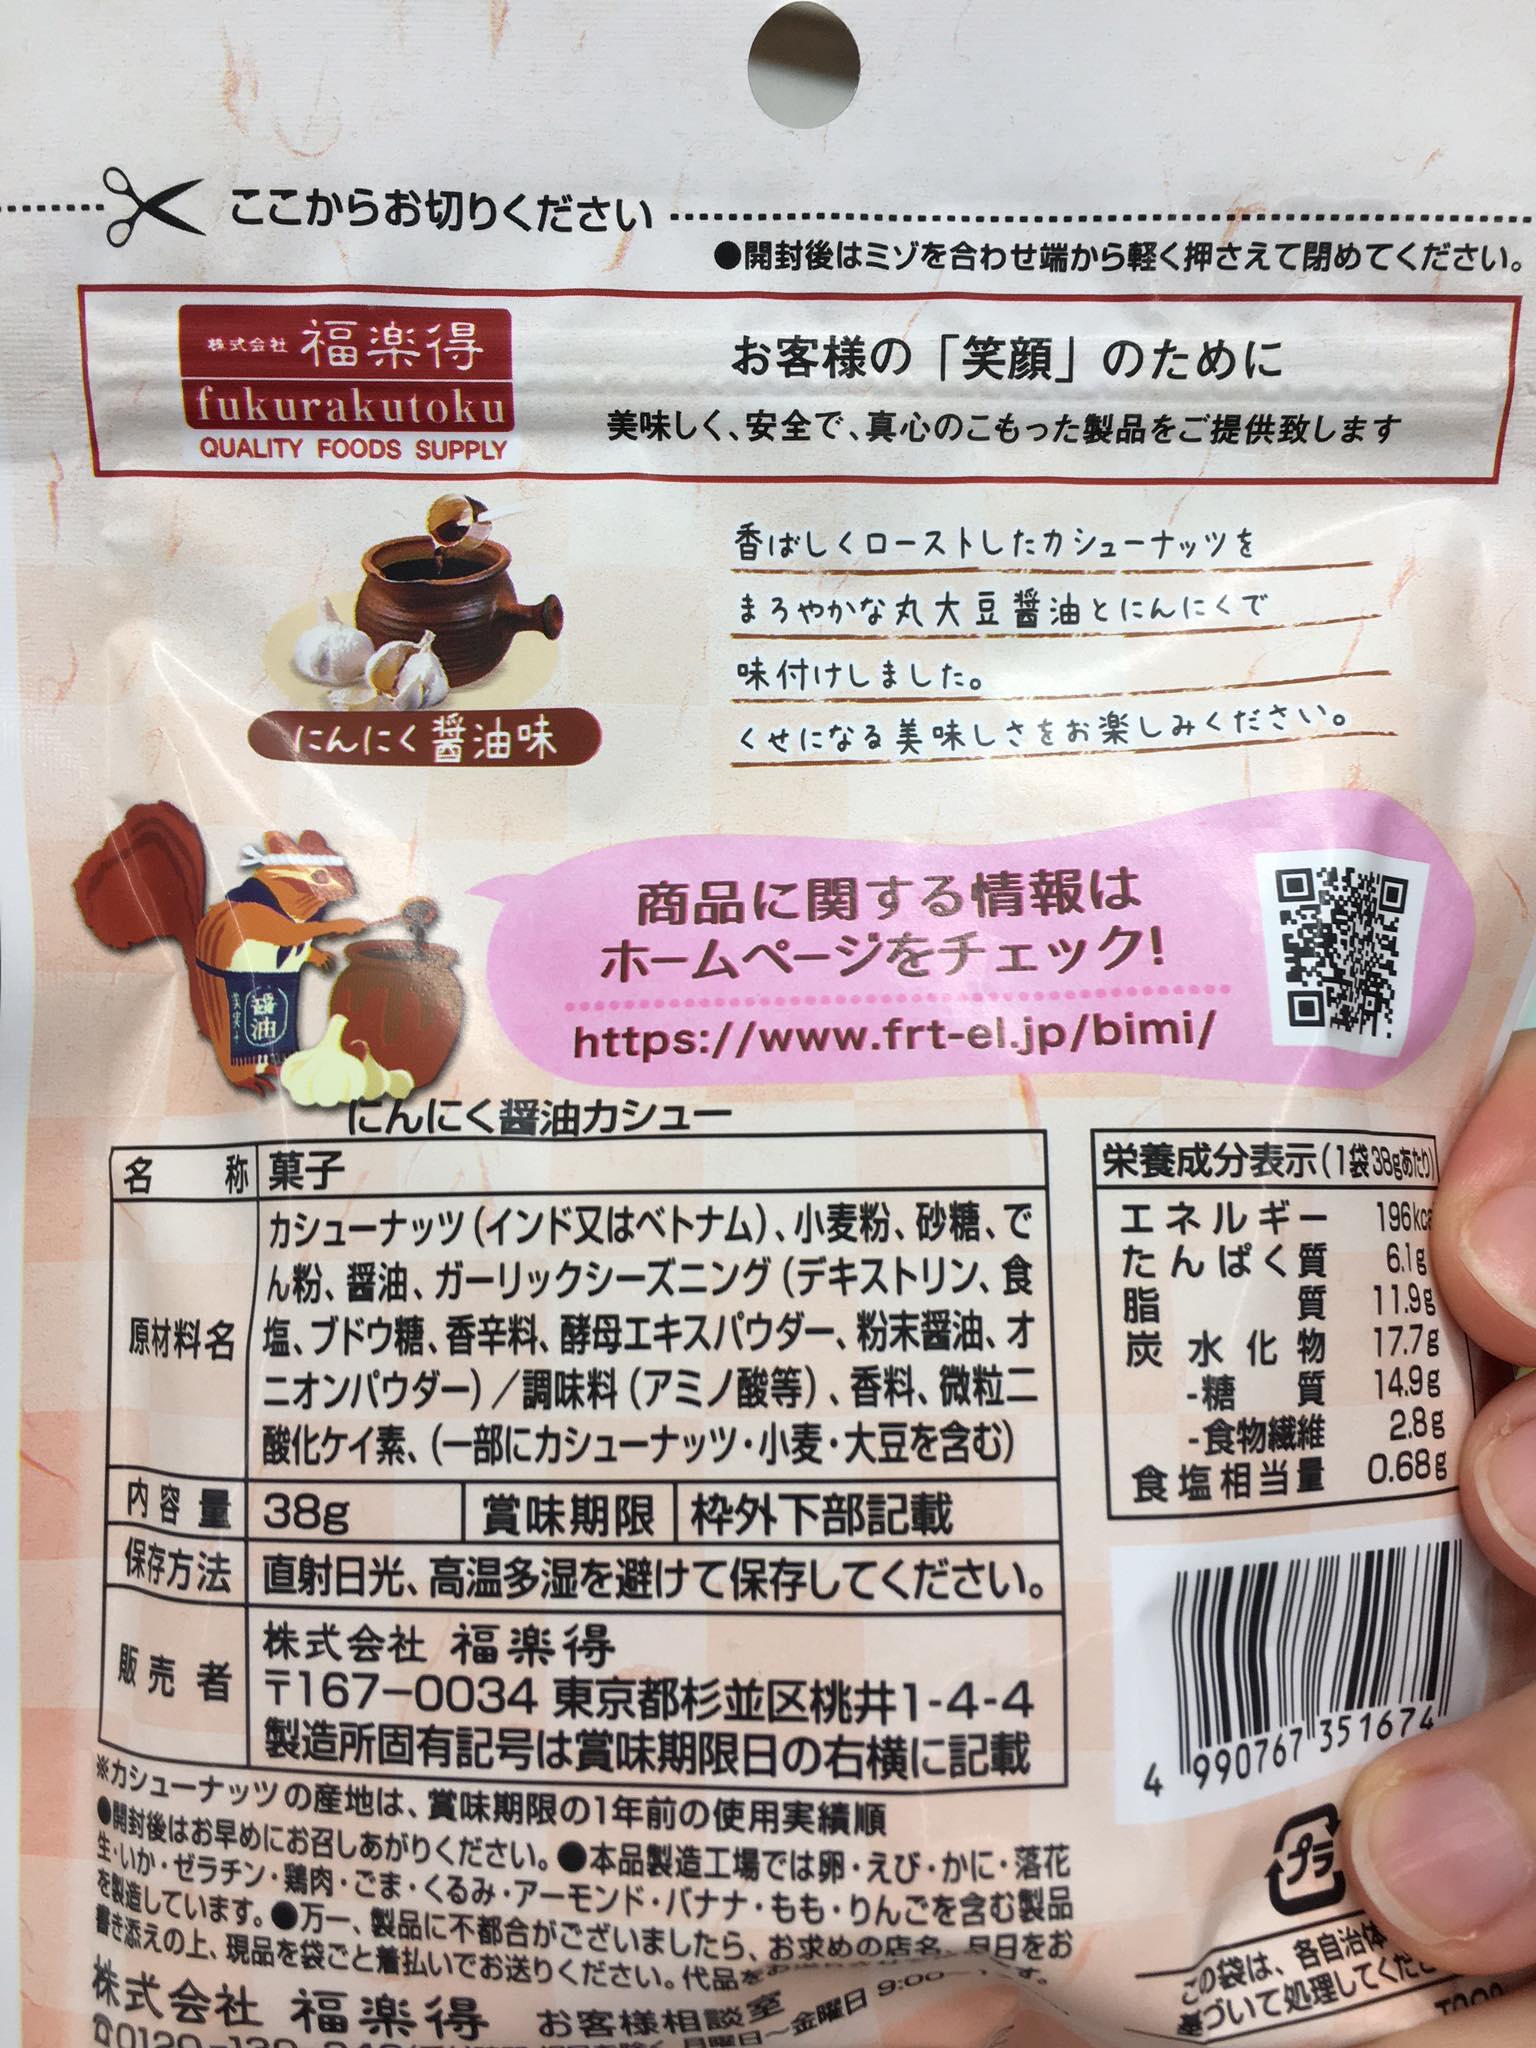 Bimi Plus Garlic Soy Sauce Cashew back of package